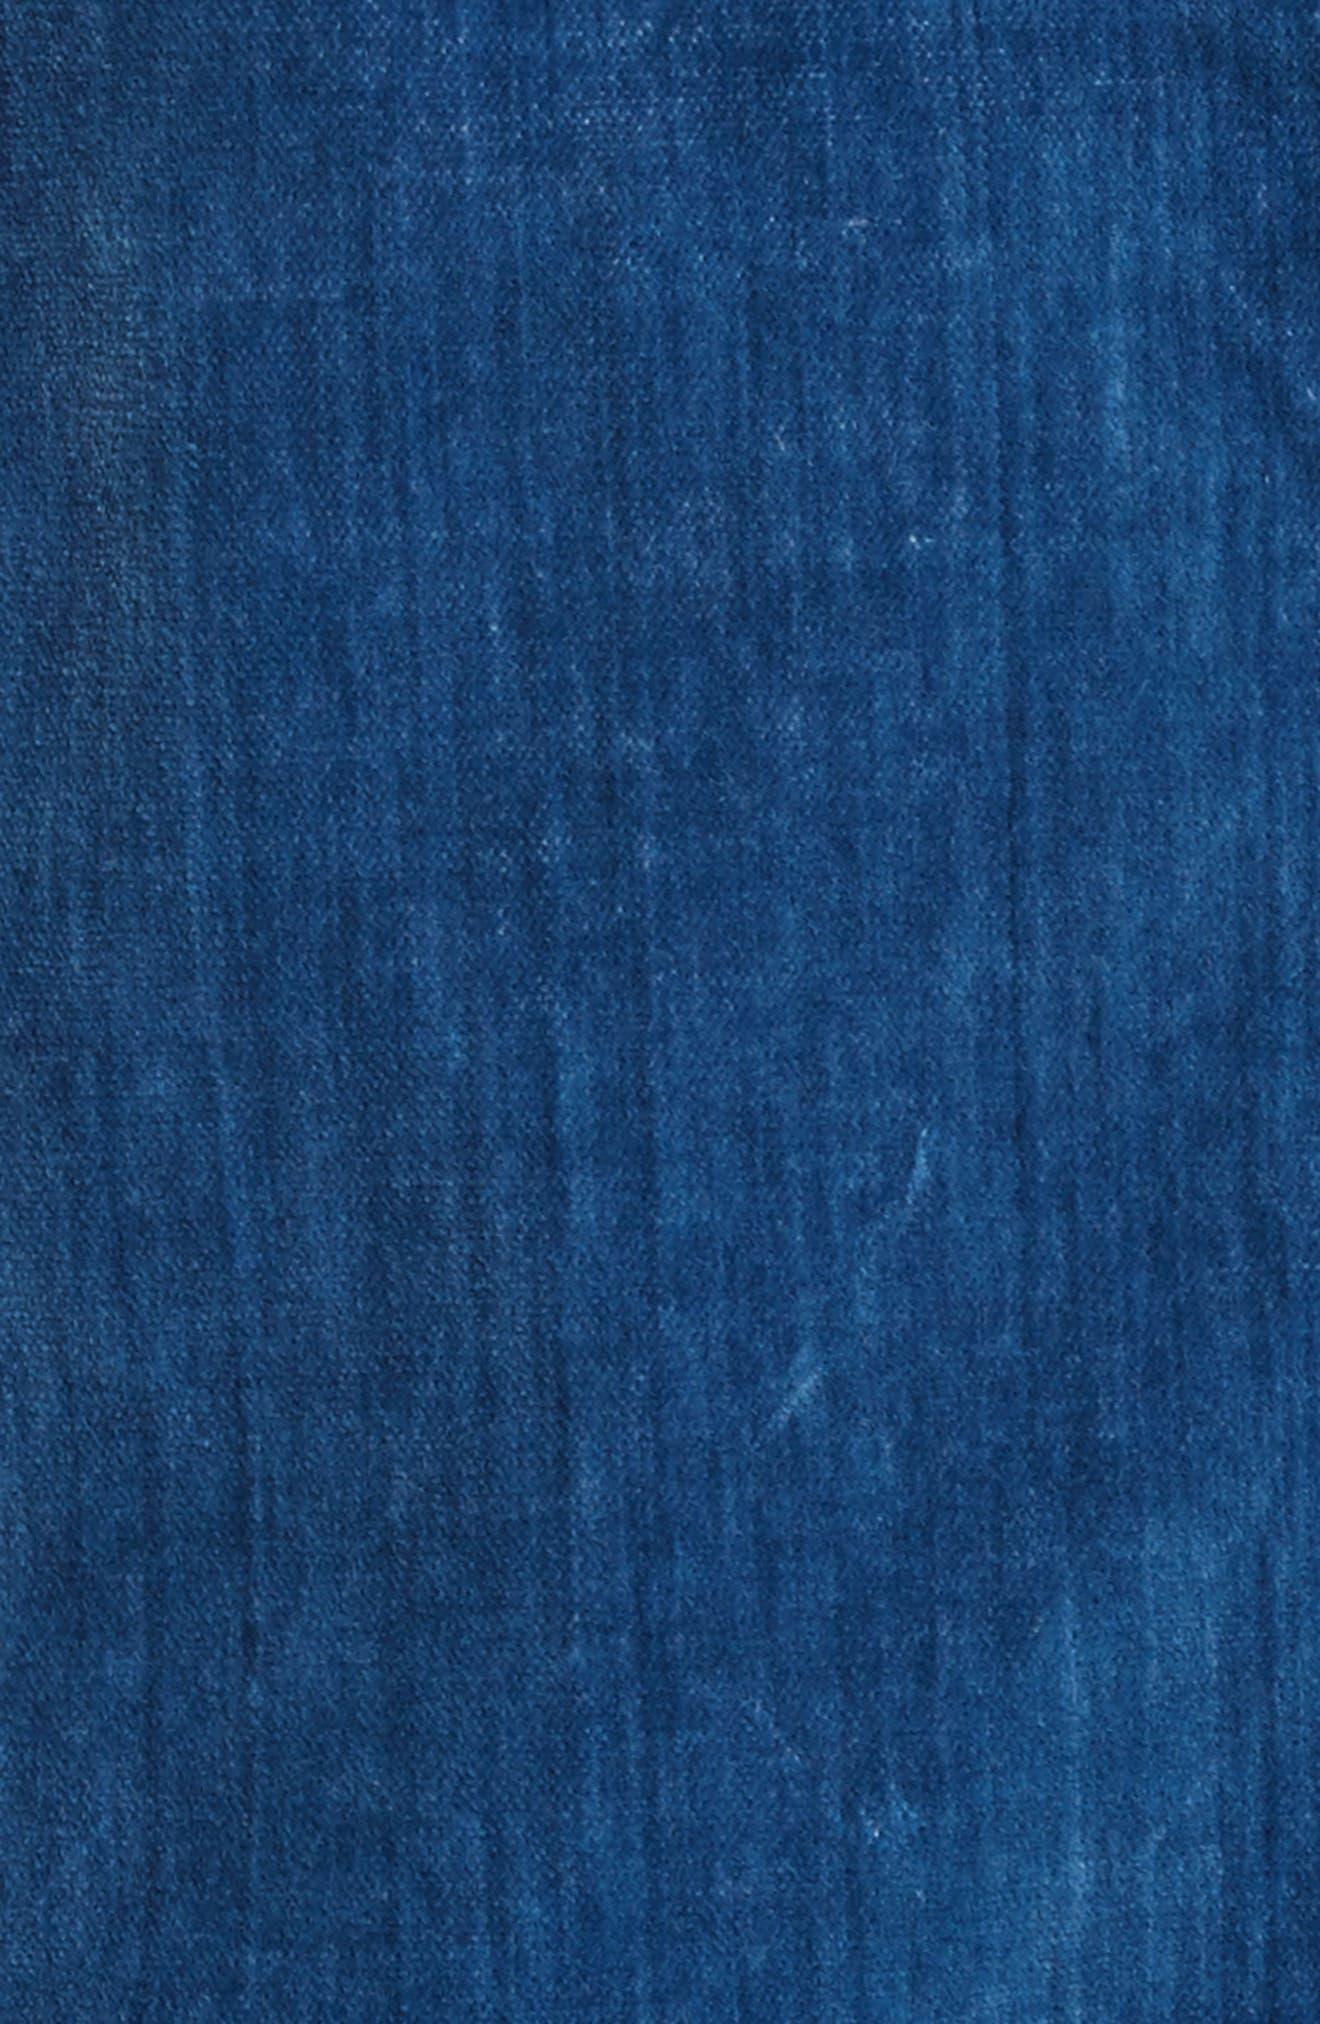 Velvet Denim Jacket,                             Alternate thumbnail 5, color,                             Dark Blueprint Patch Wash